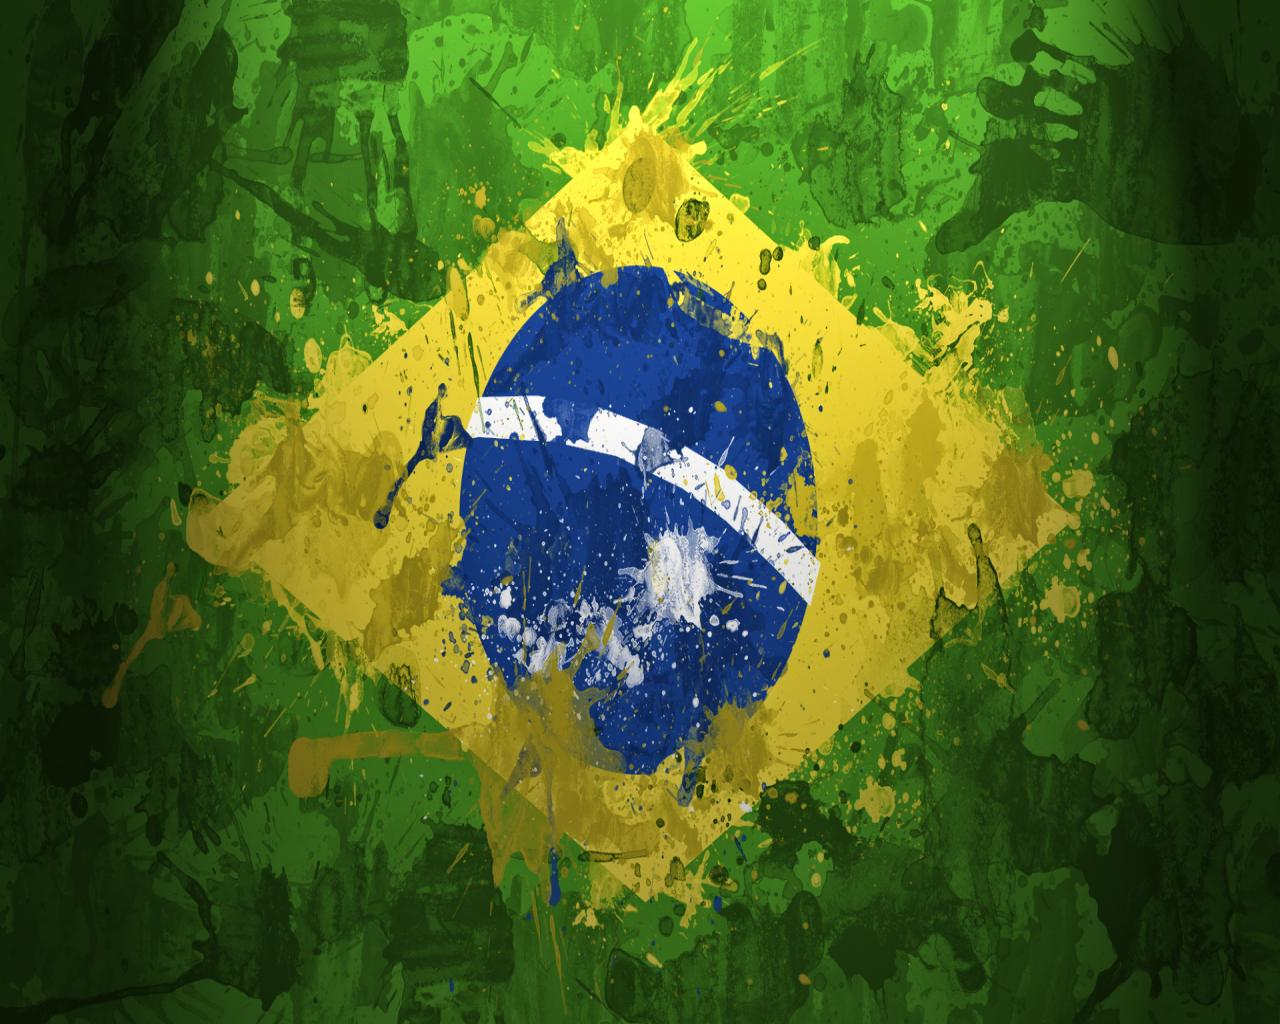 Brasil 2014 ingresará más de 4,6k millones de euros con @elMundial